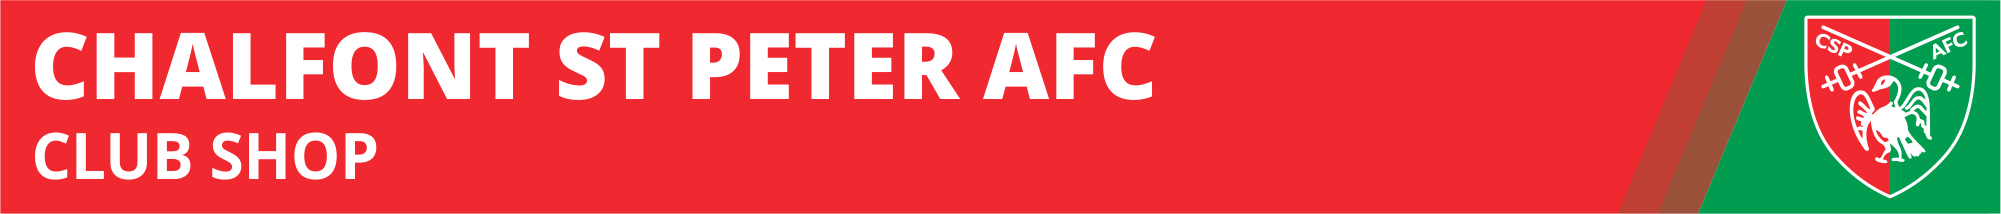 chalfont-st-peter-afc-club-shop-banner.png